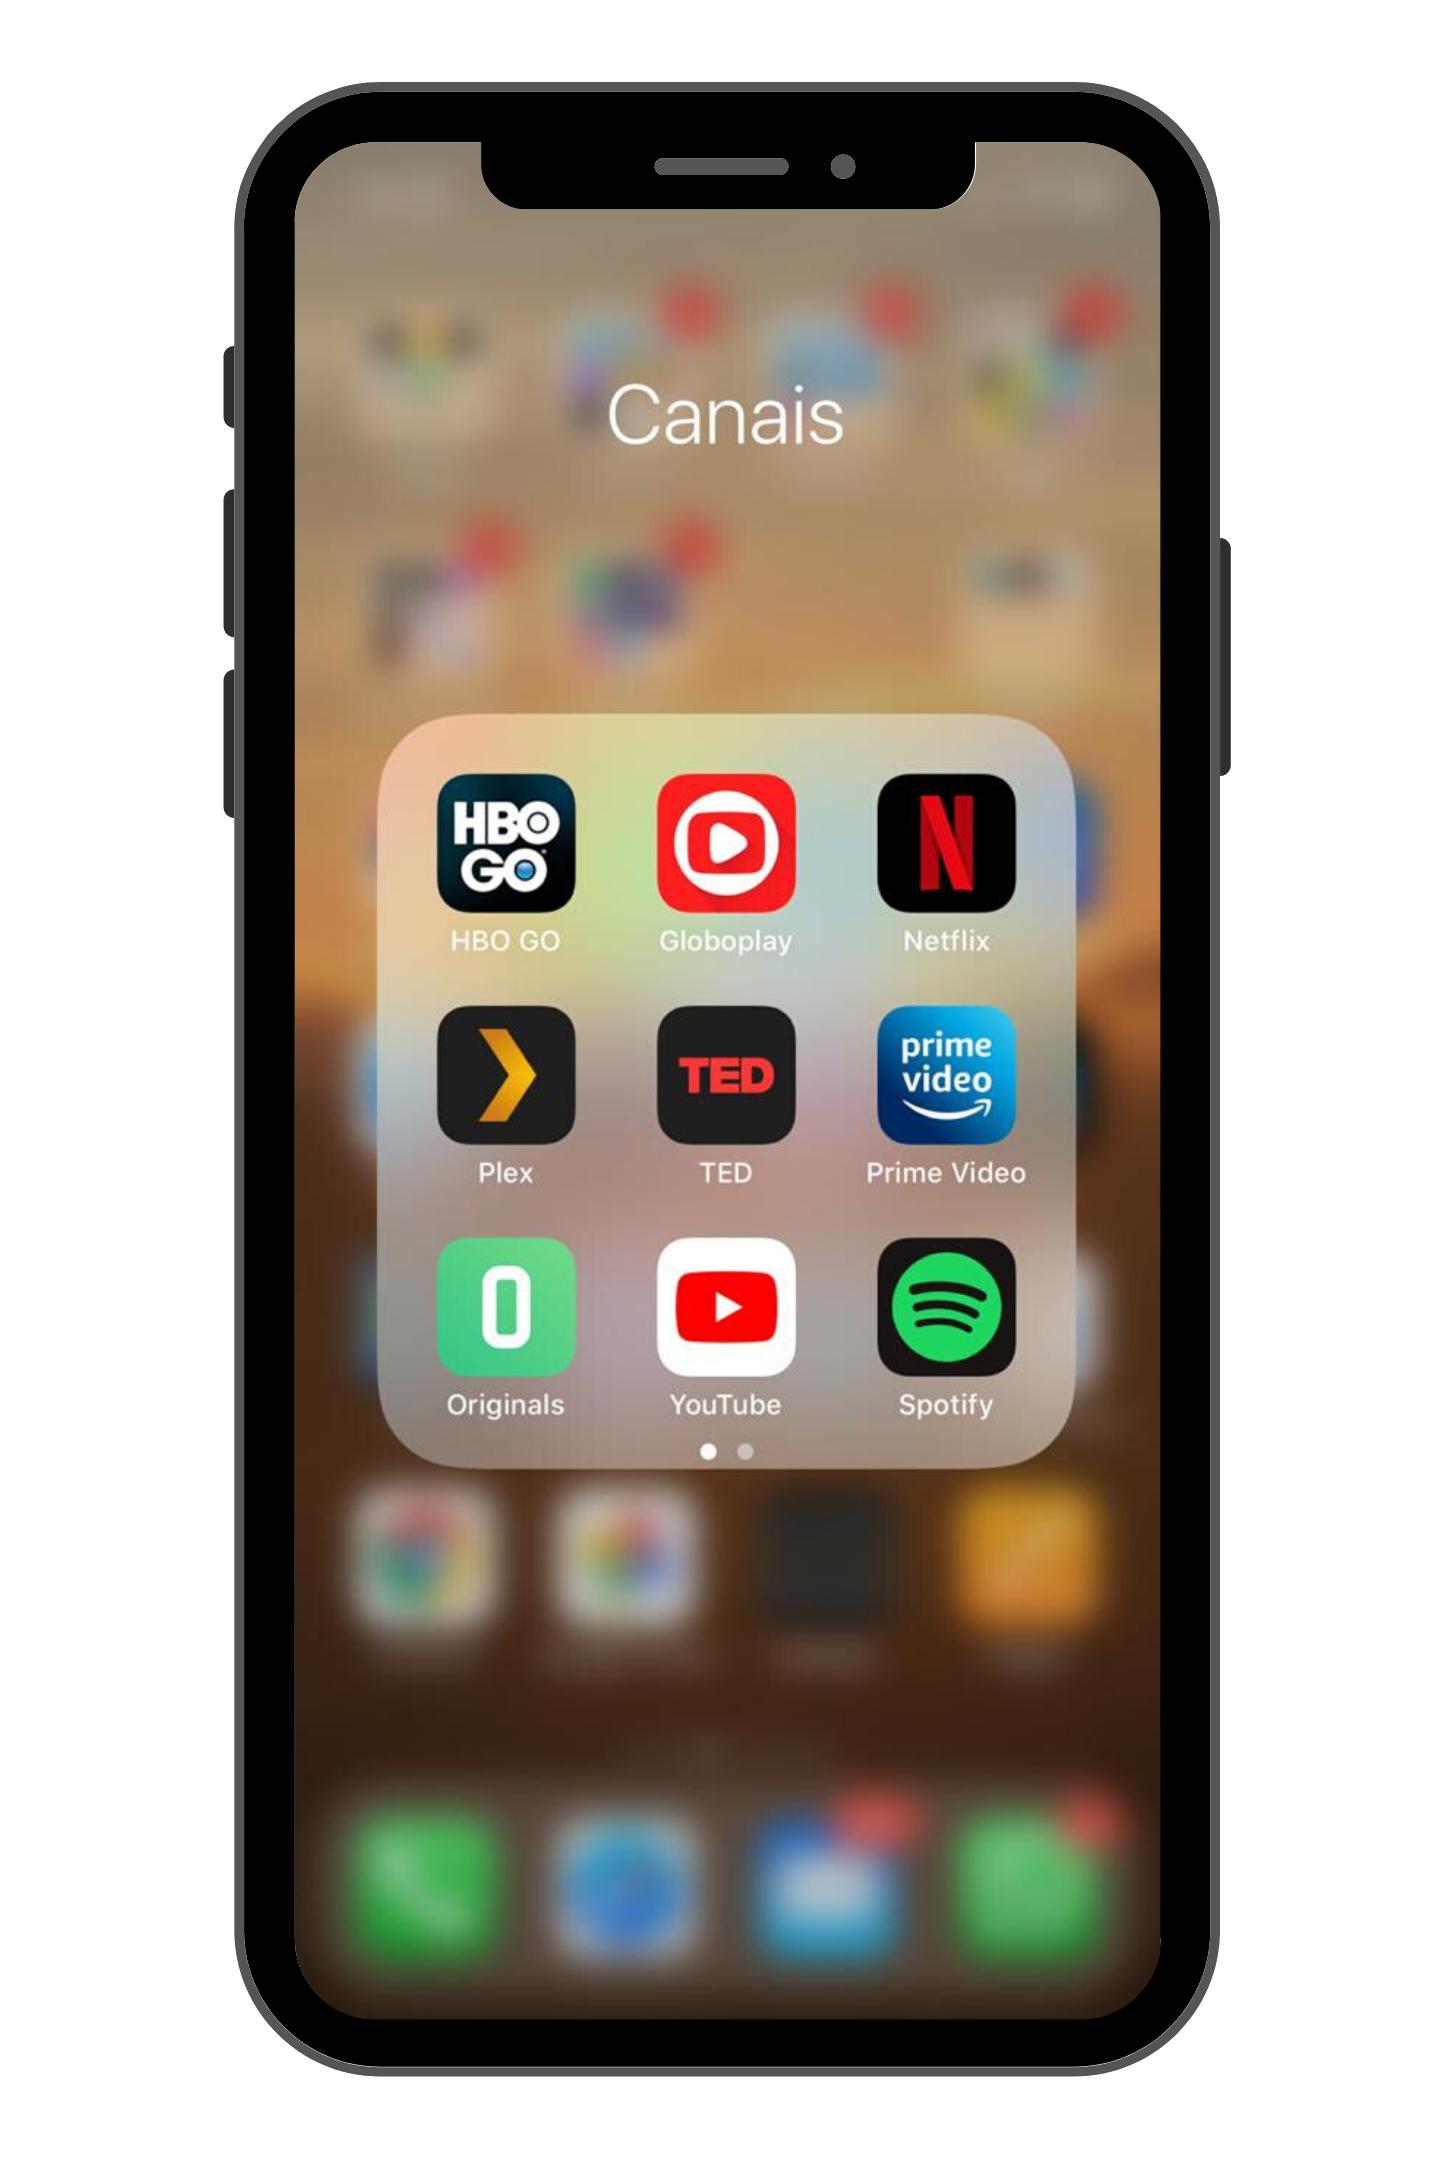 Globoplay, Hulu, Netflix, Youtube, HBOGO